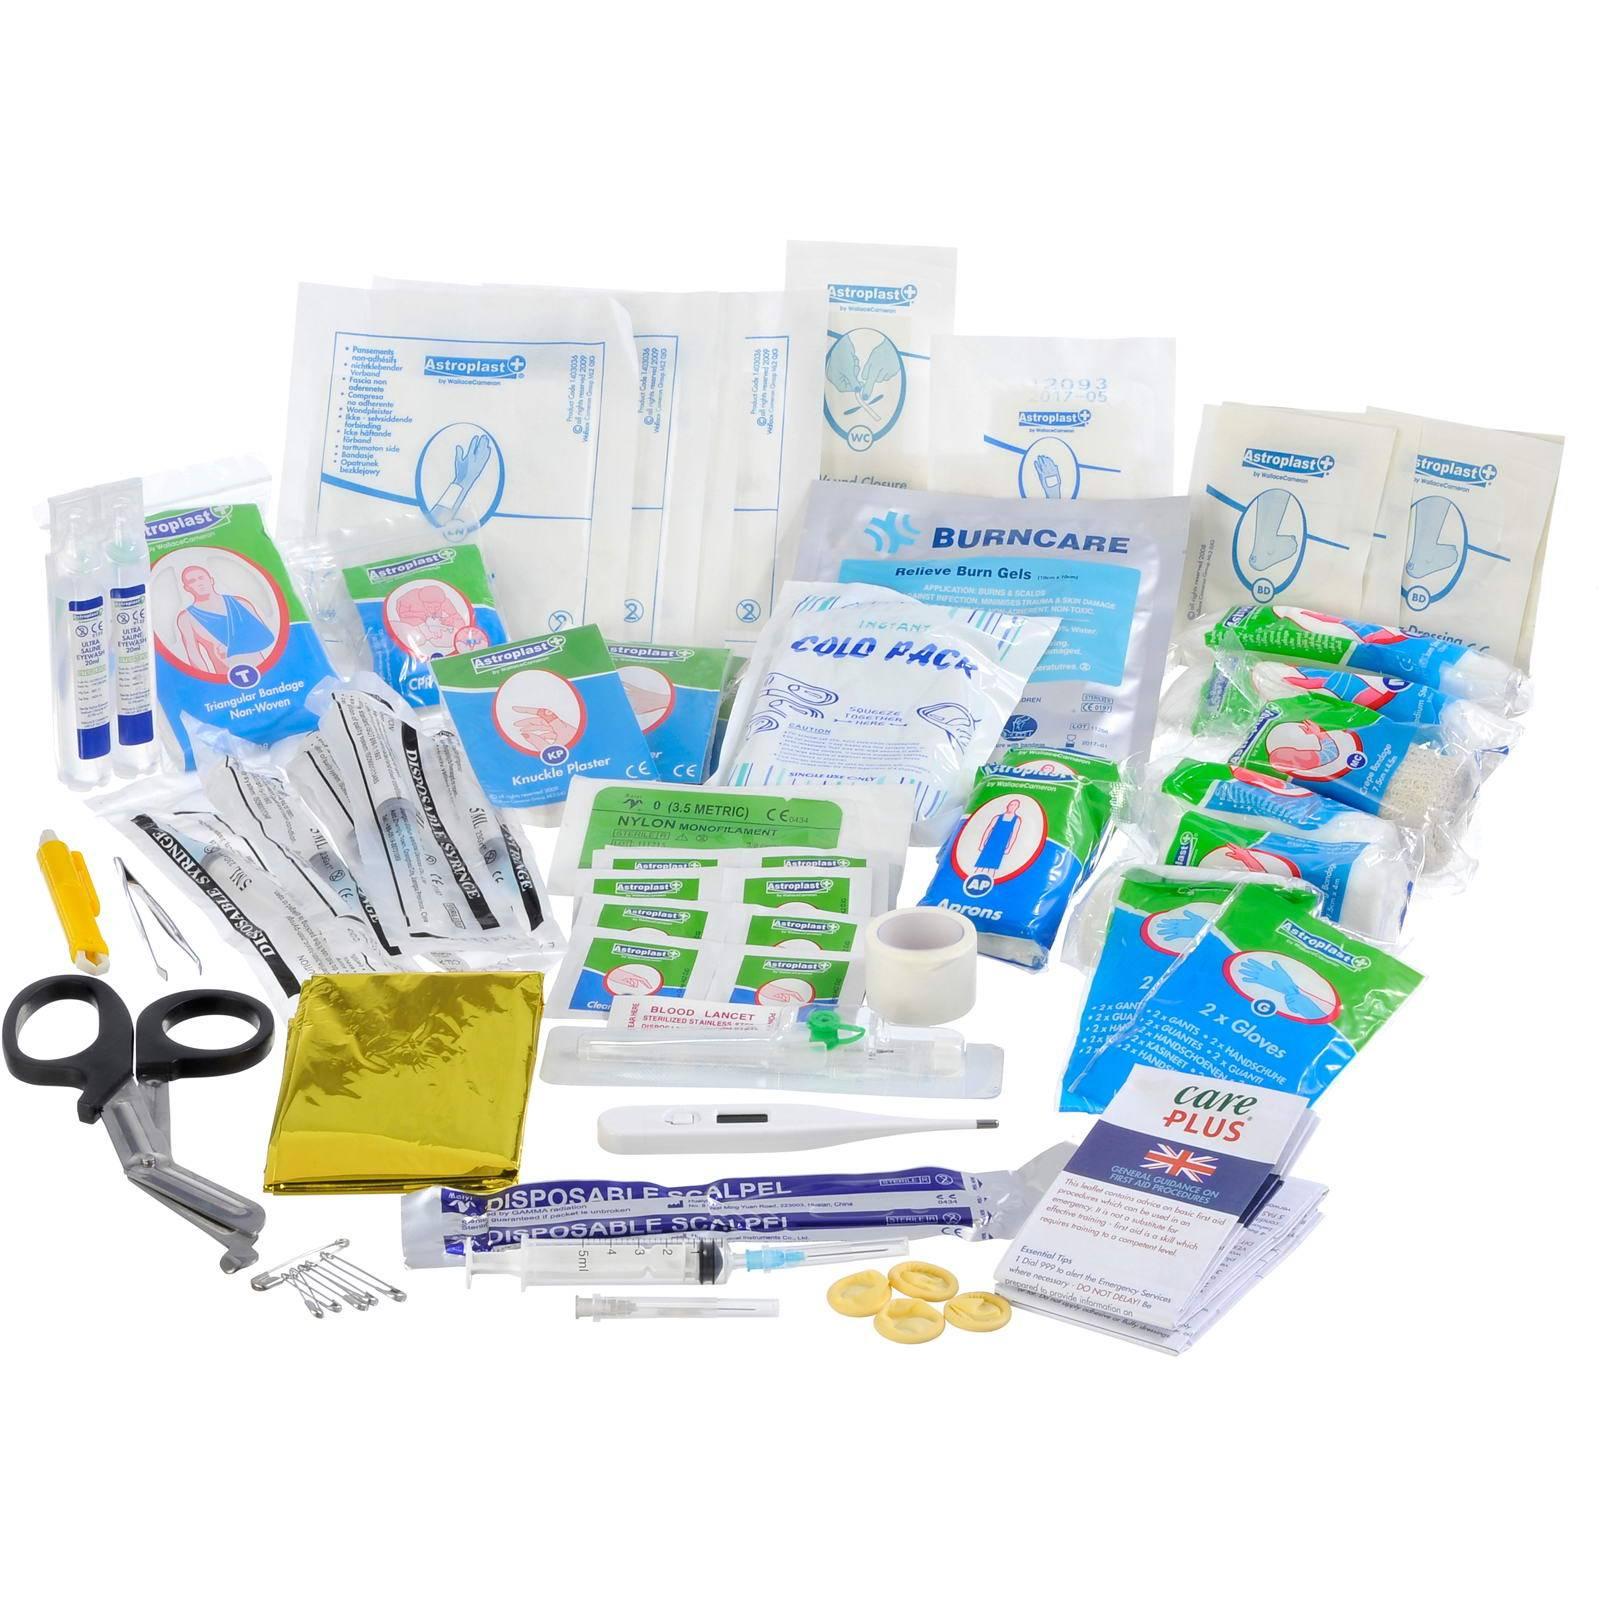 Care Plus First Aid Kit Professional - Bild 2